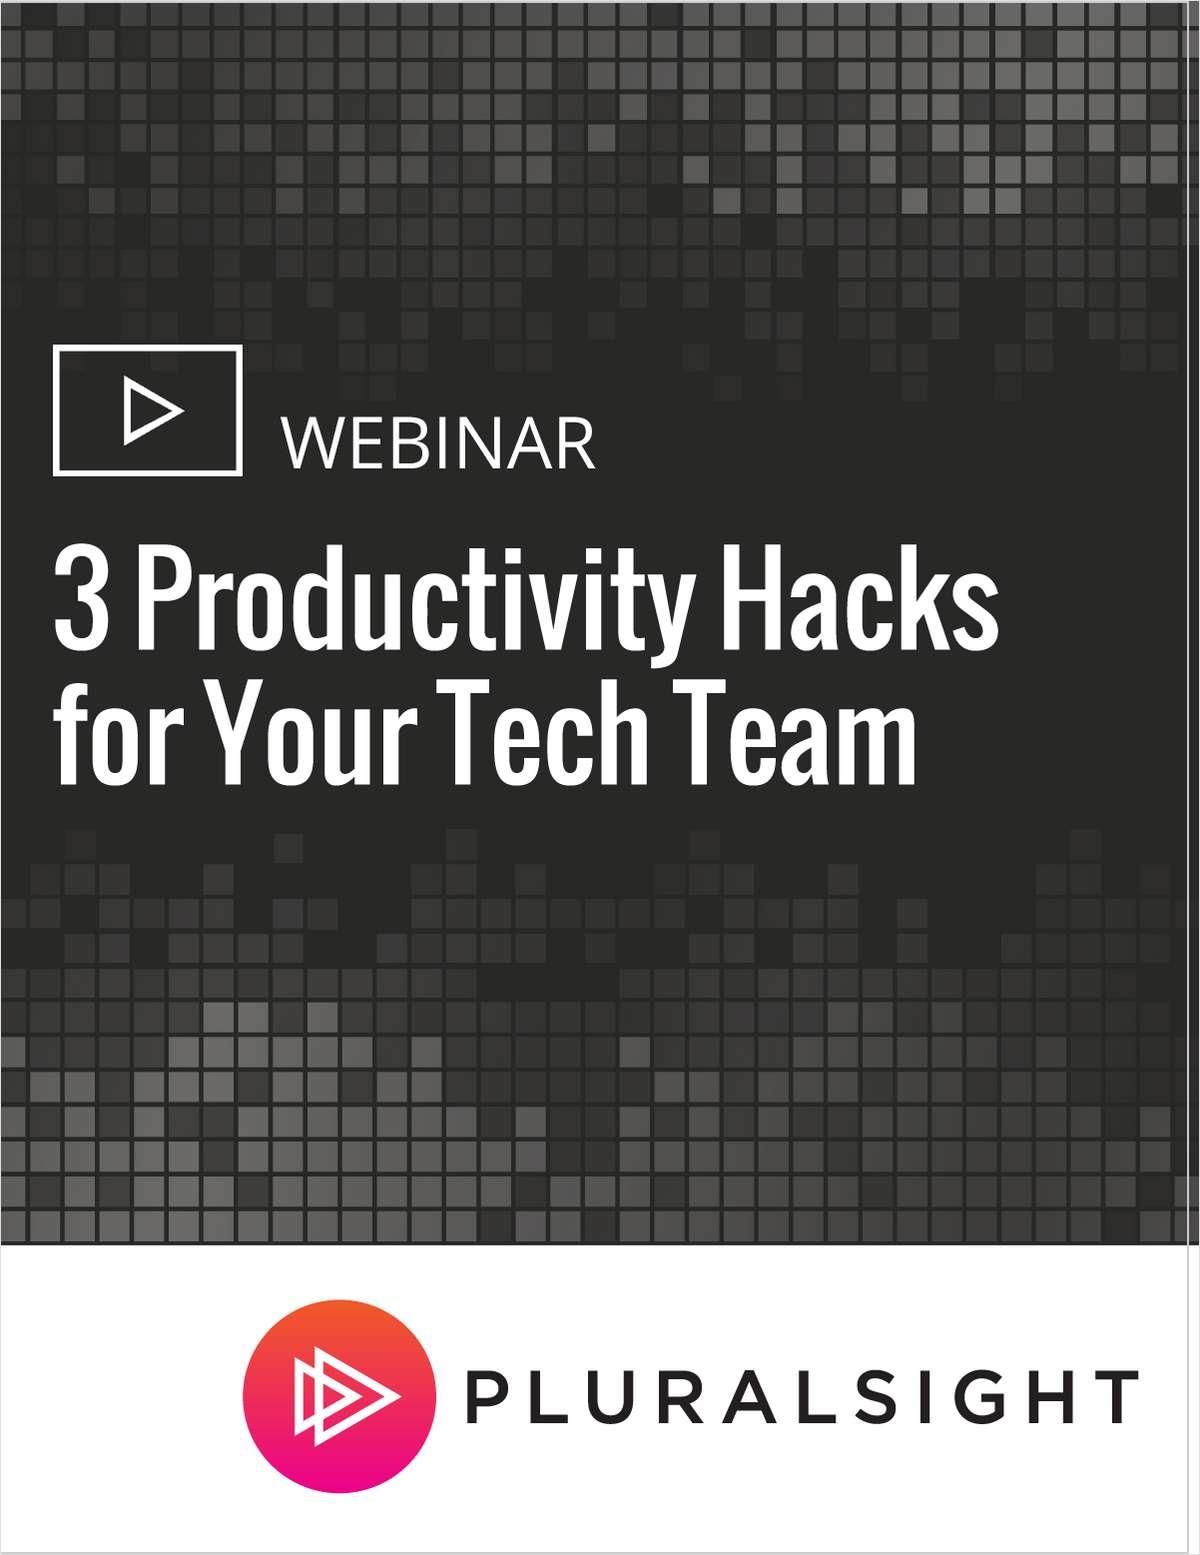 3 Productivity Hacks for Your Tech Team